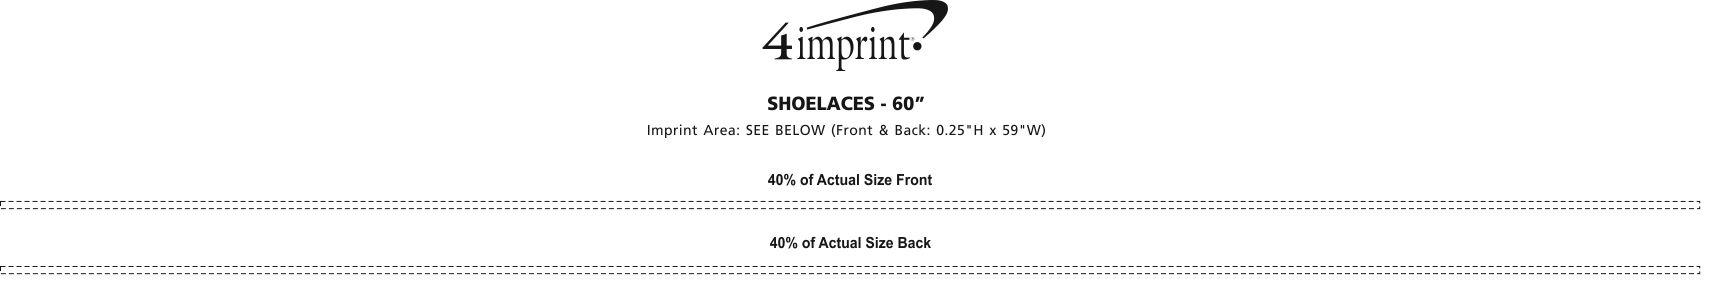 "Imprint Area of Shoelaces - 60"""